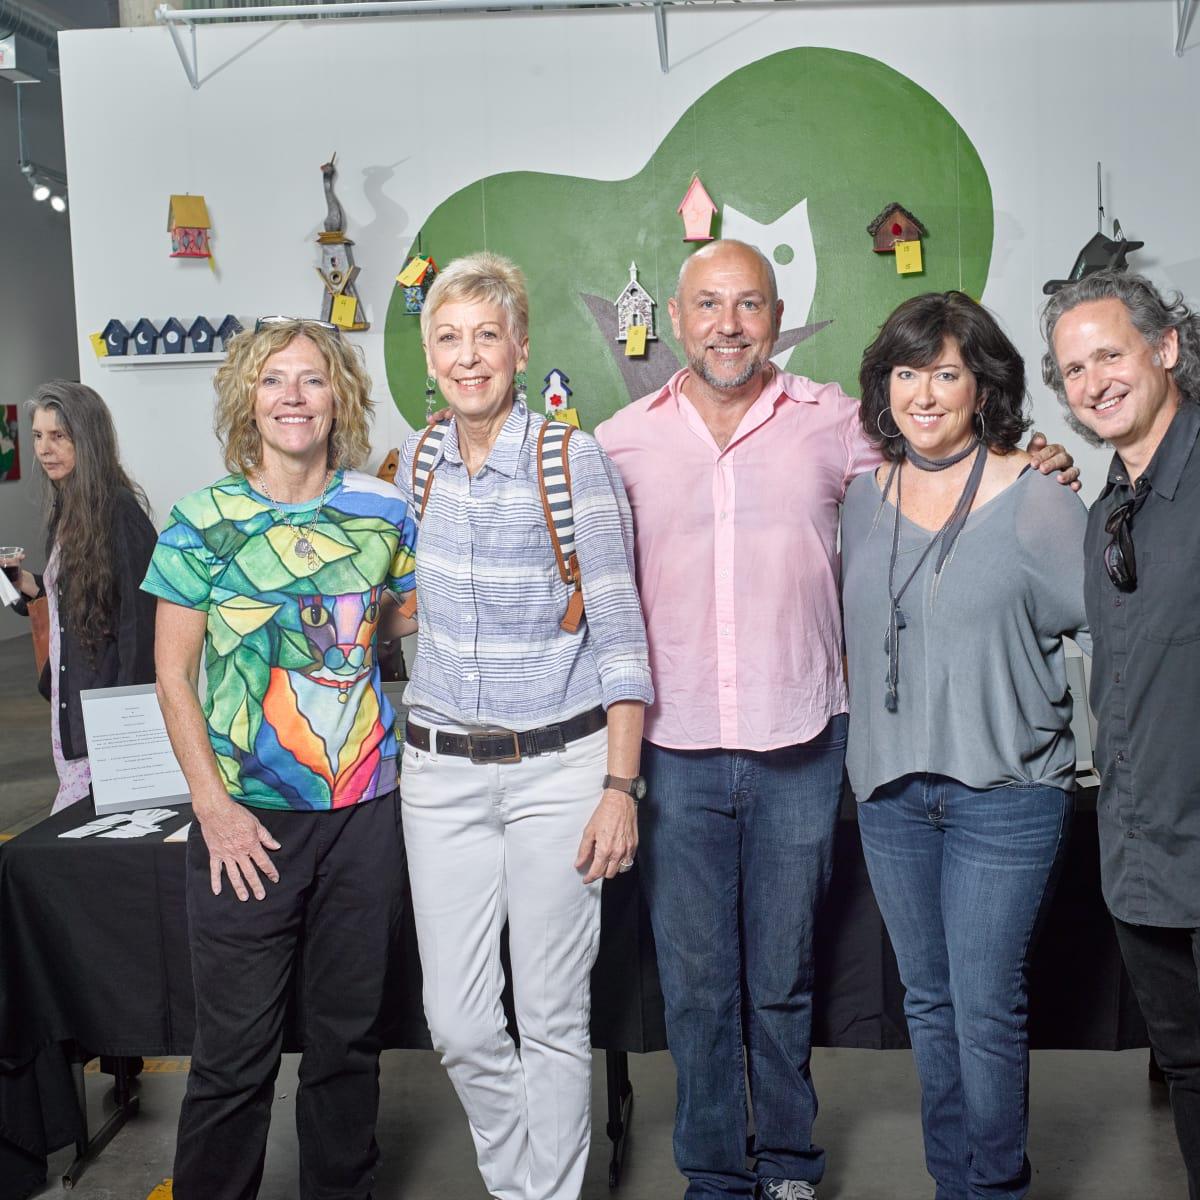 Participating artists in celebrity birdhouses, April Murphy, Chris Silkwood, Nicola Parente, Susan Tietz, Taft McWhorter at Sawyer Yards Artist Stroll